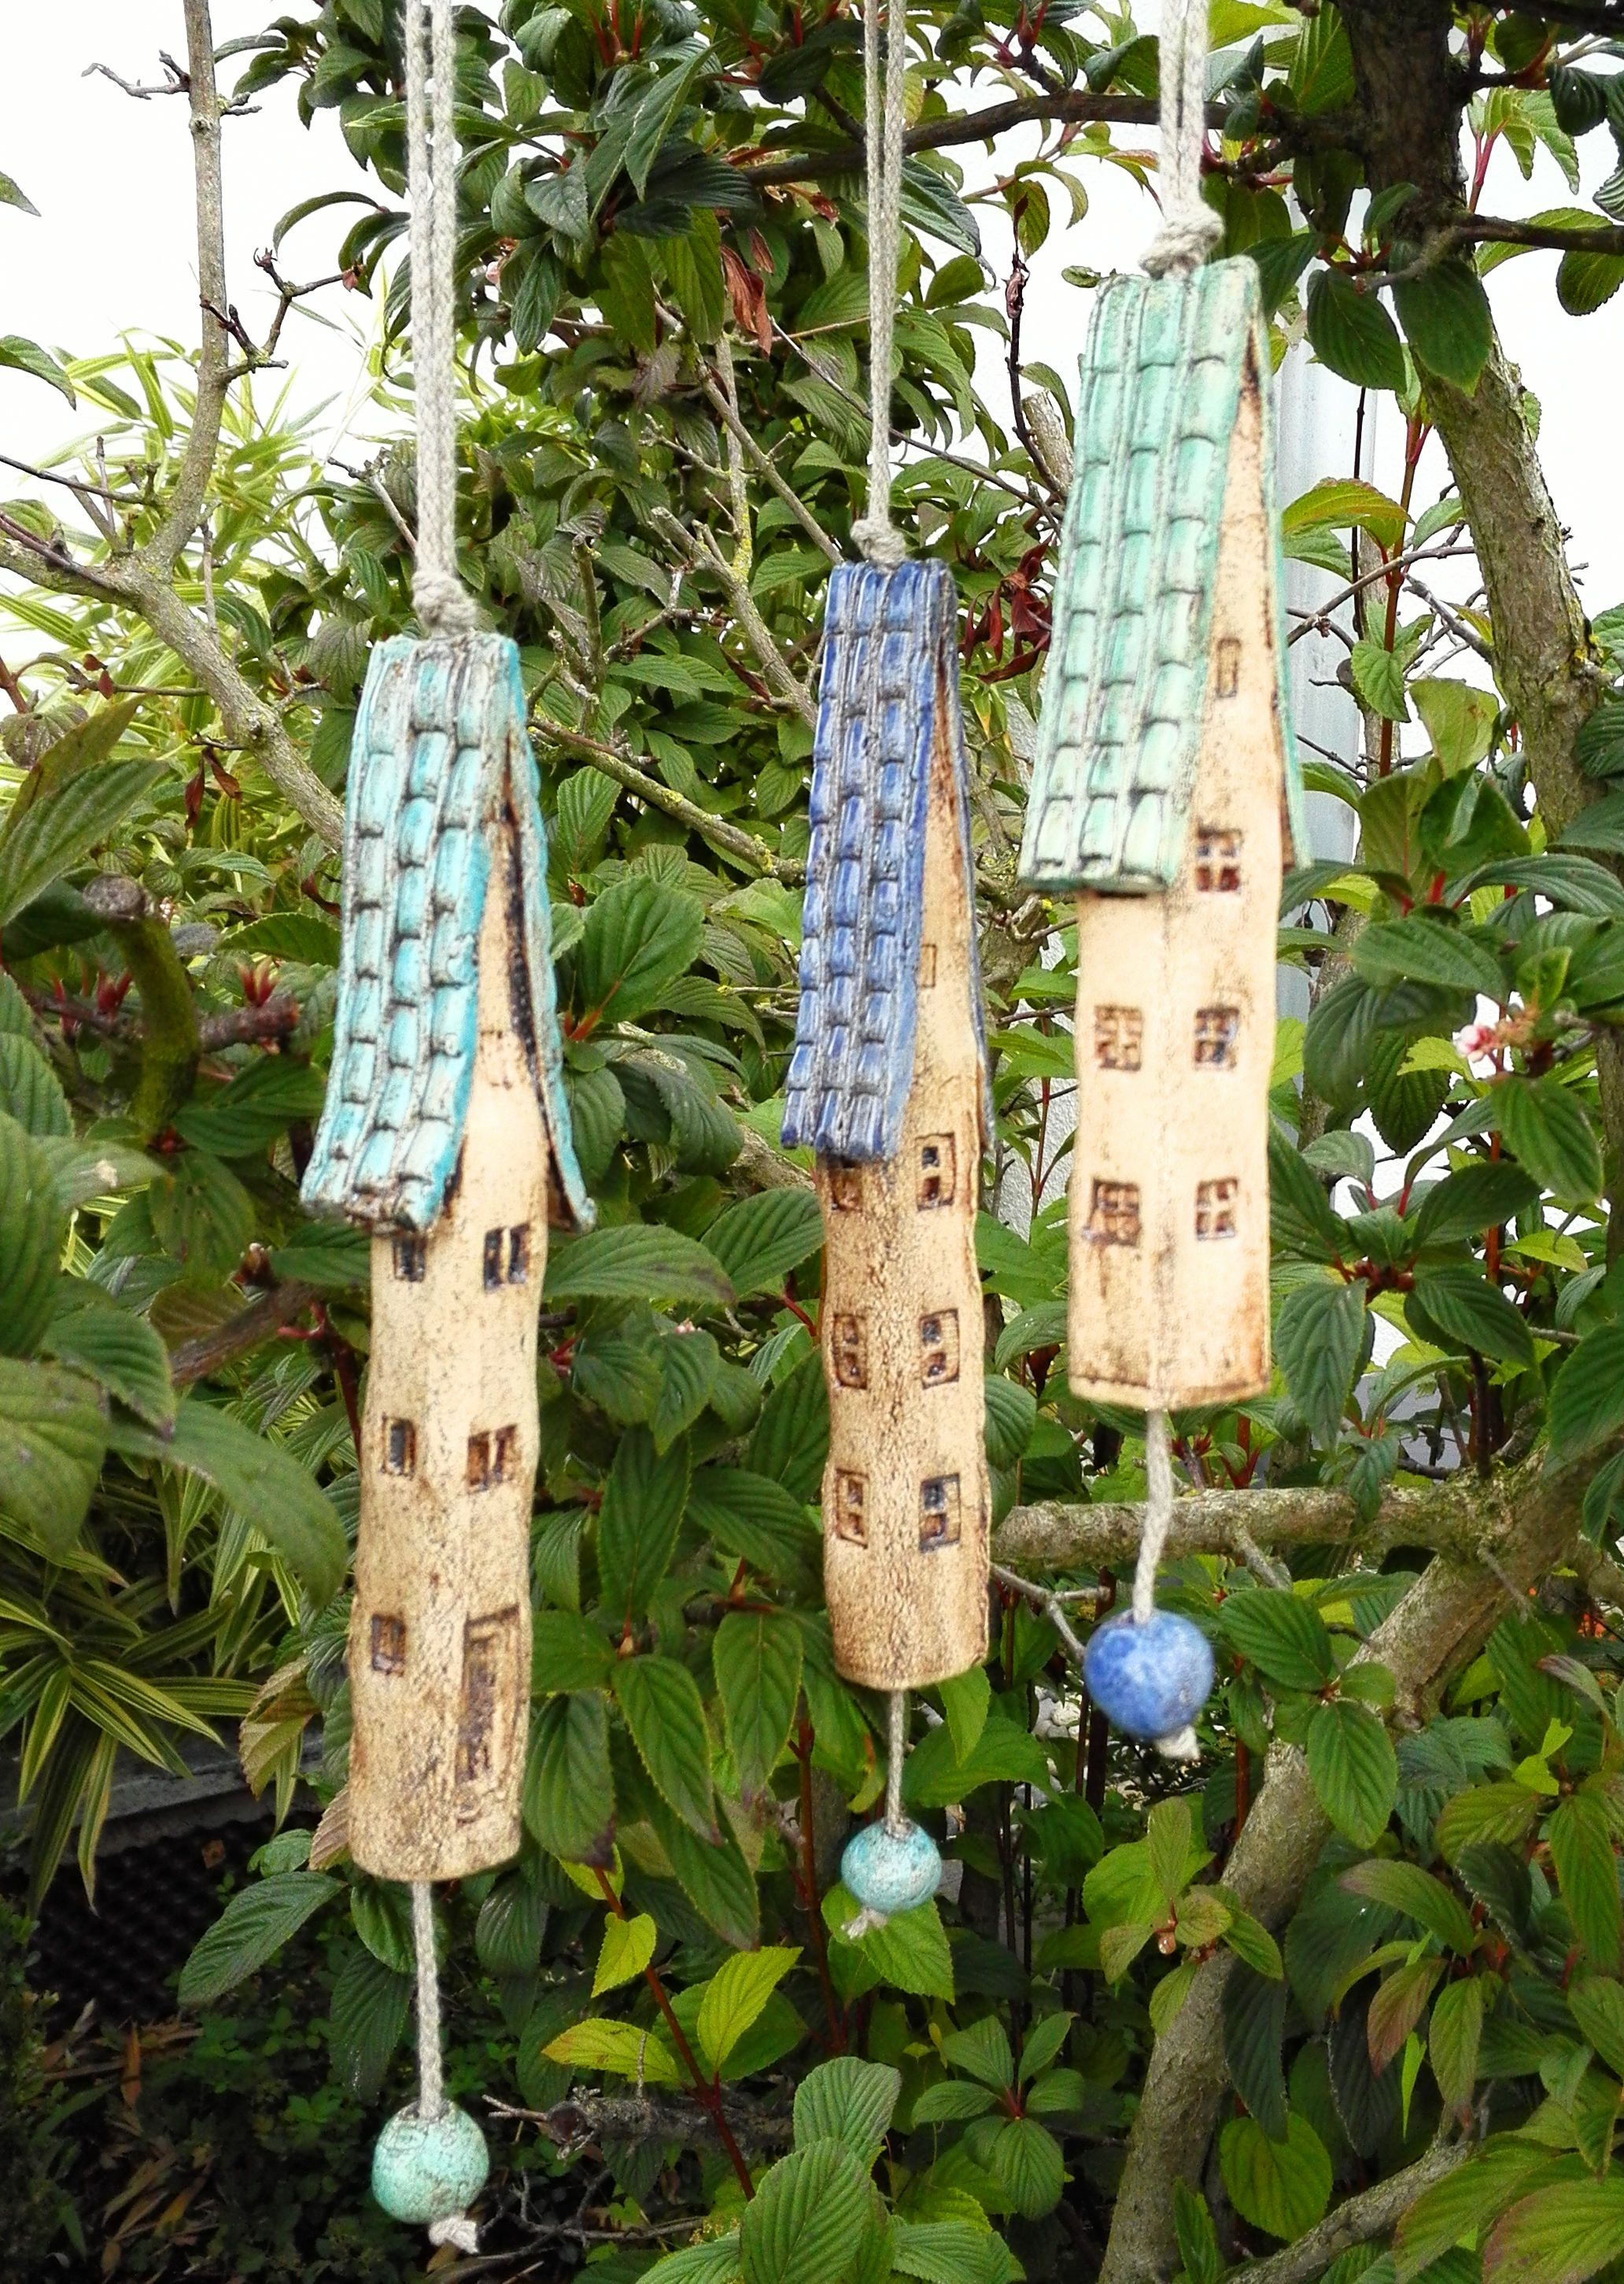 3 ceramic wind chime bells keramik kinder pinterest t pferei keramik t pfern und windspiele. Black Bedroom Furniture Sets. Home Design Ideas